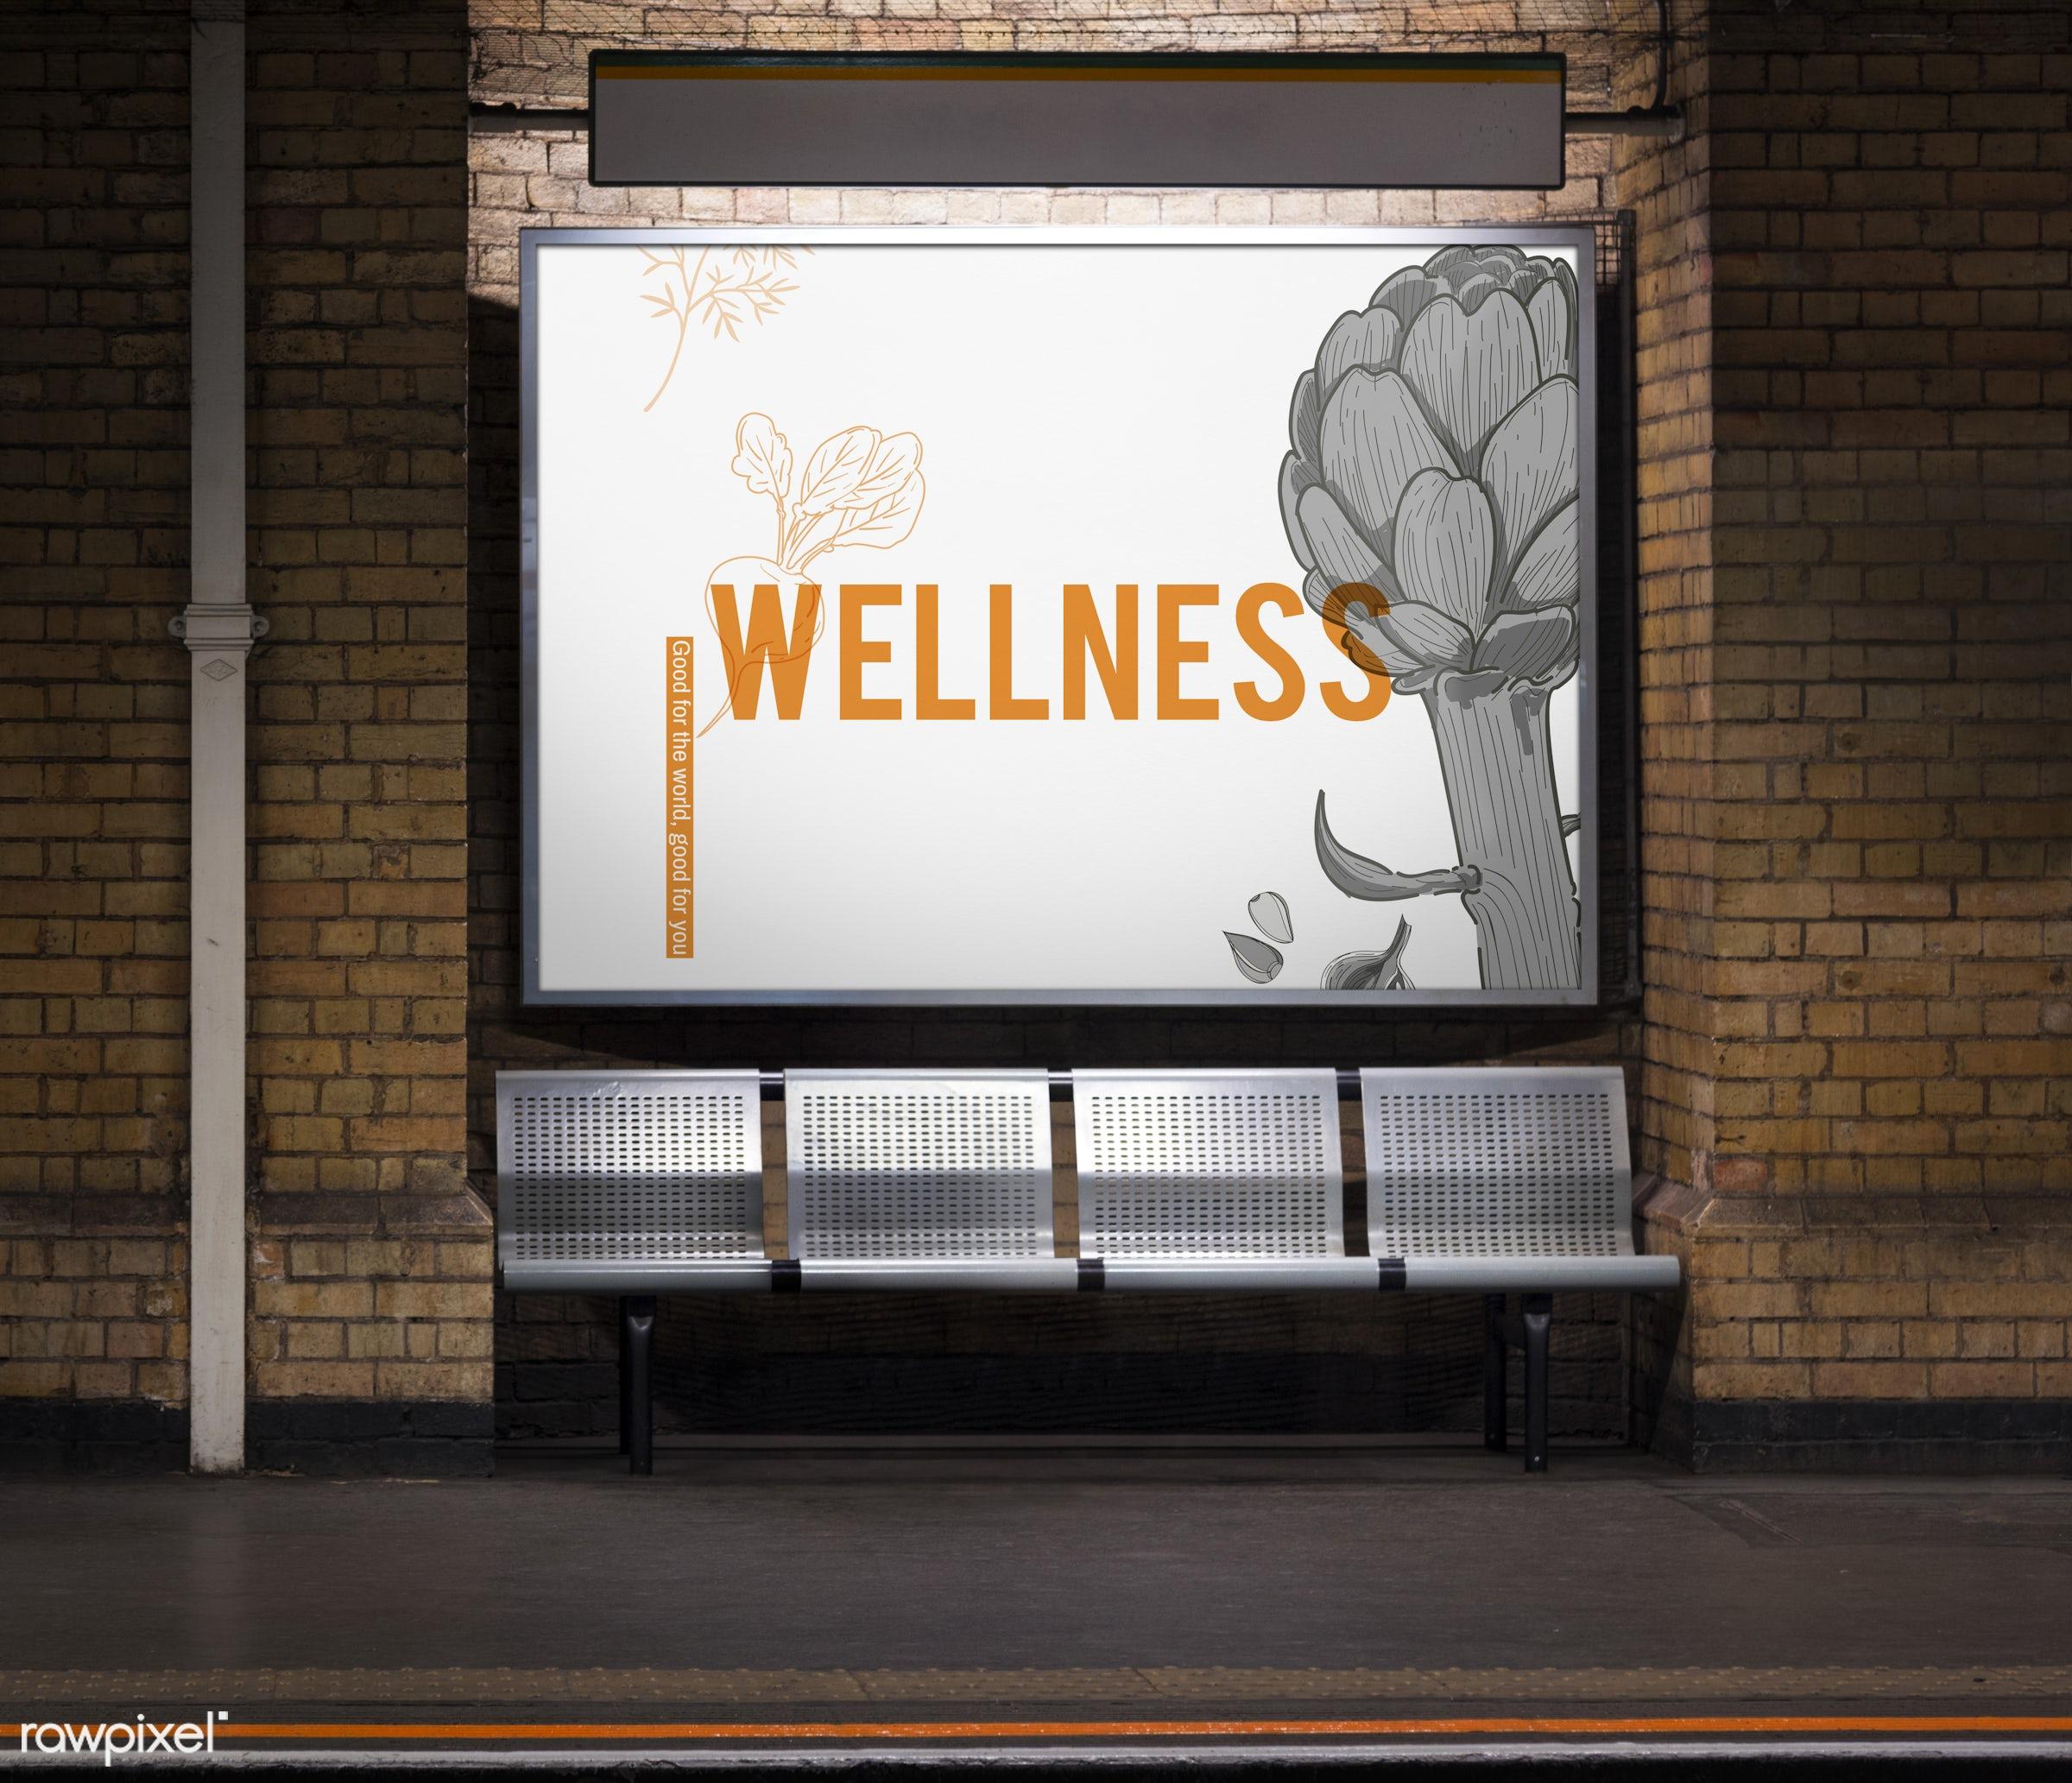 antioxidants, balance, bricks, brickswall, care, diet, diversity, eating, exercise, food, fresh, graphic, health, healthcare...